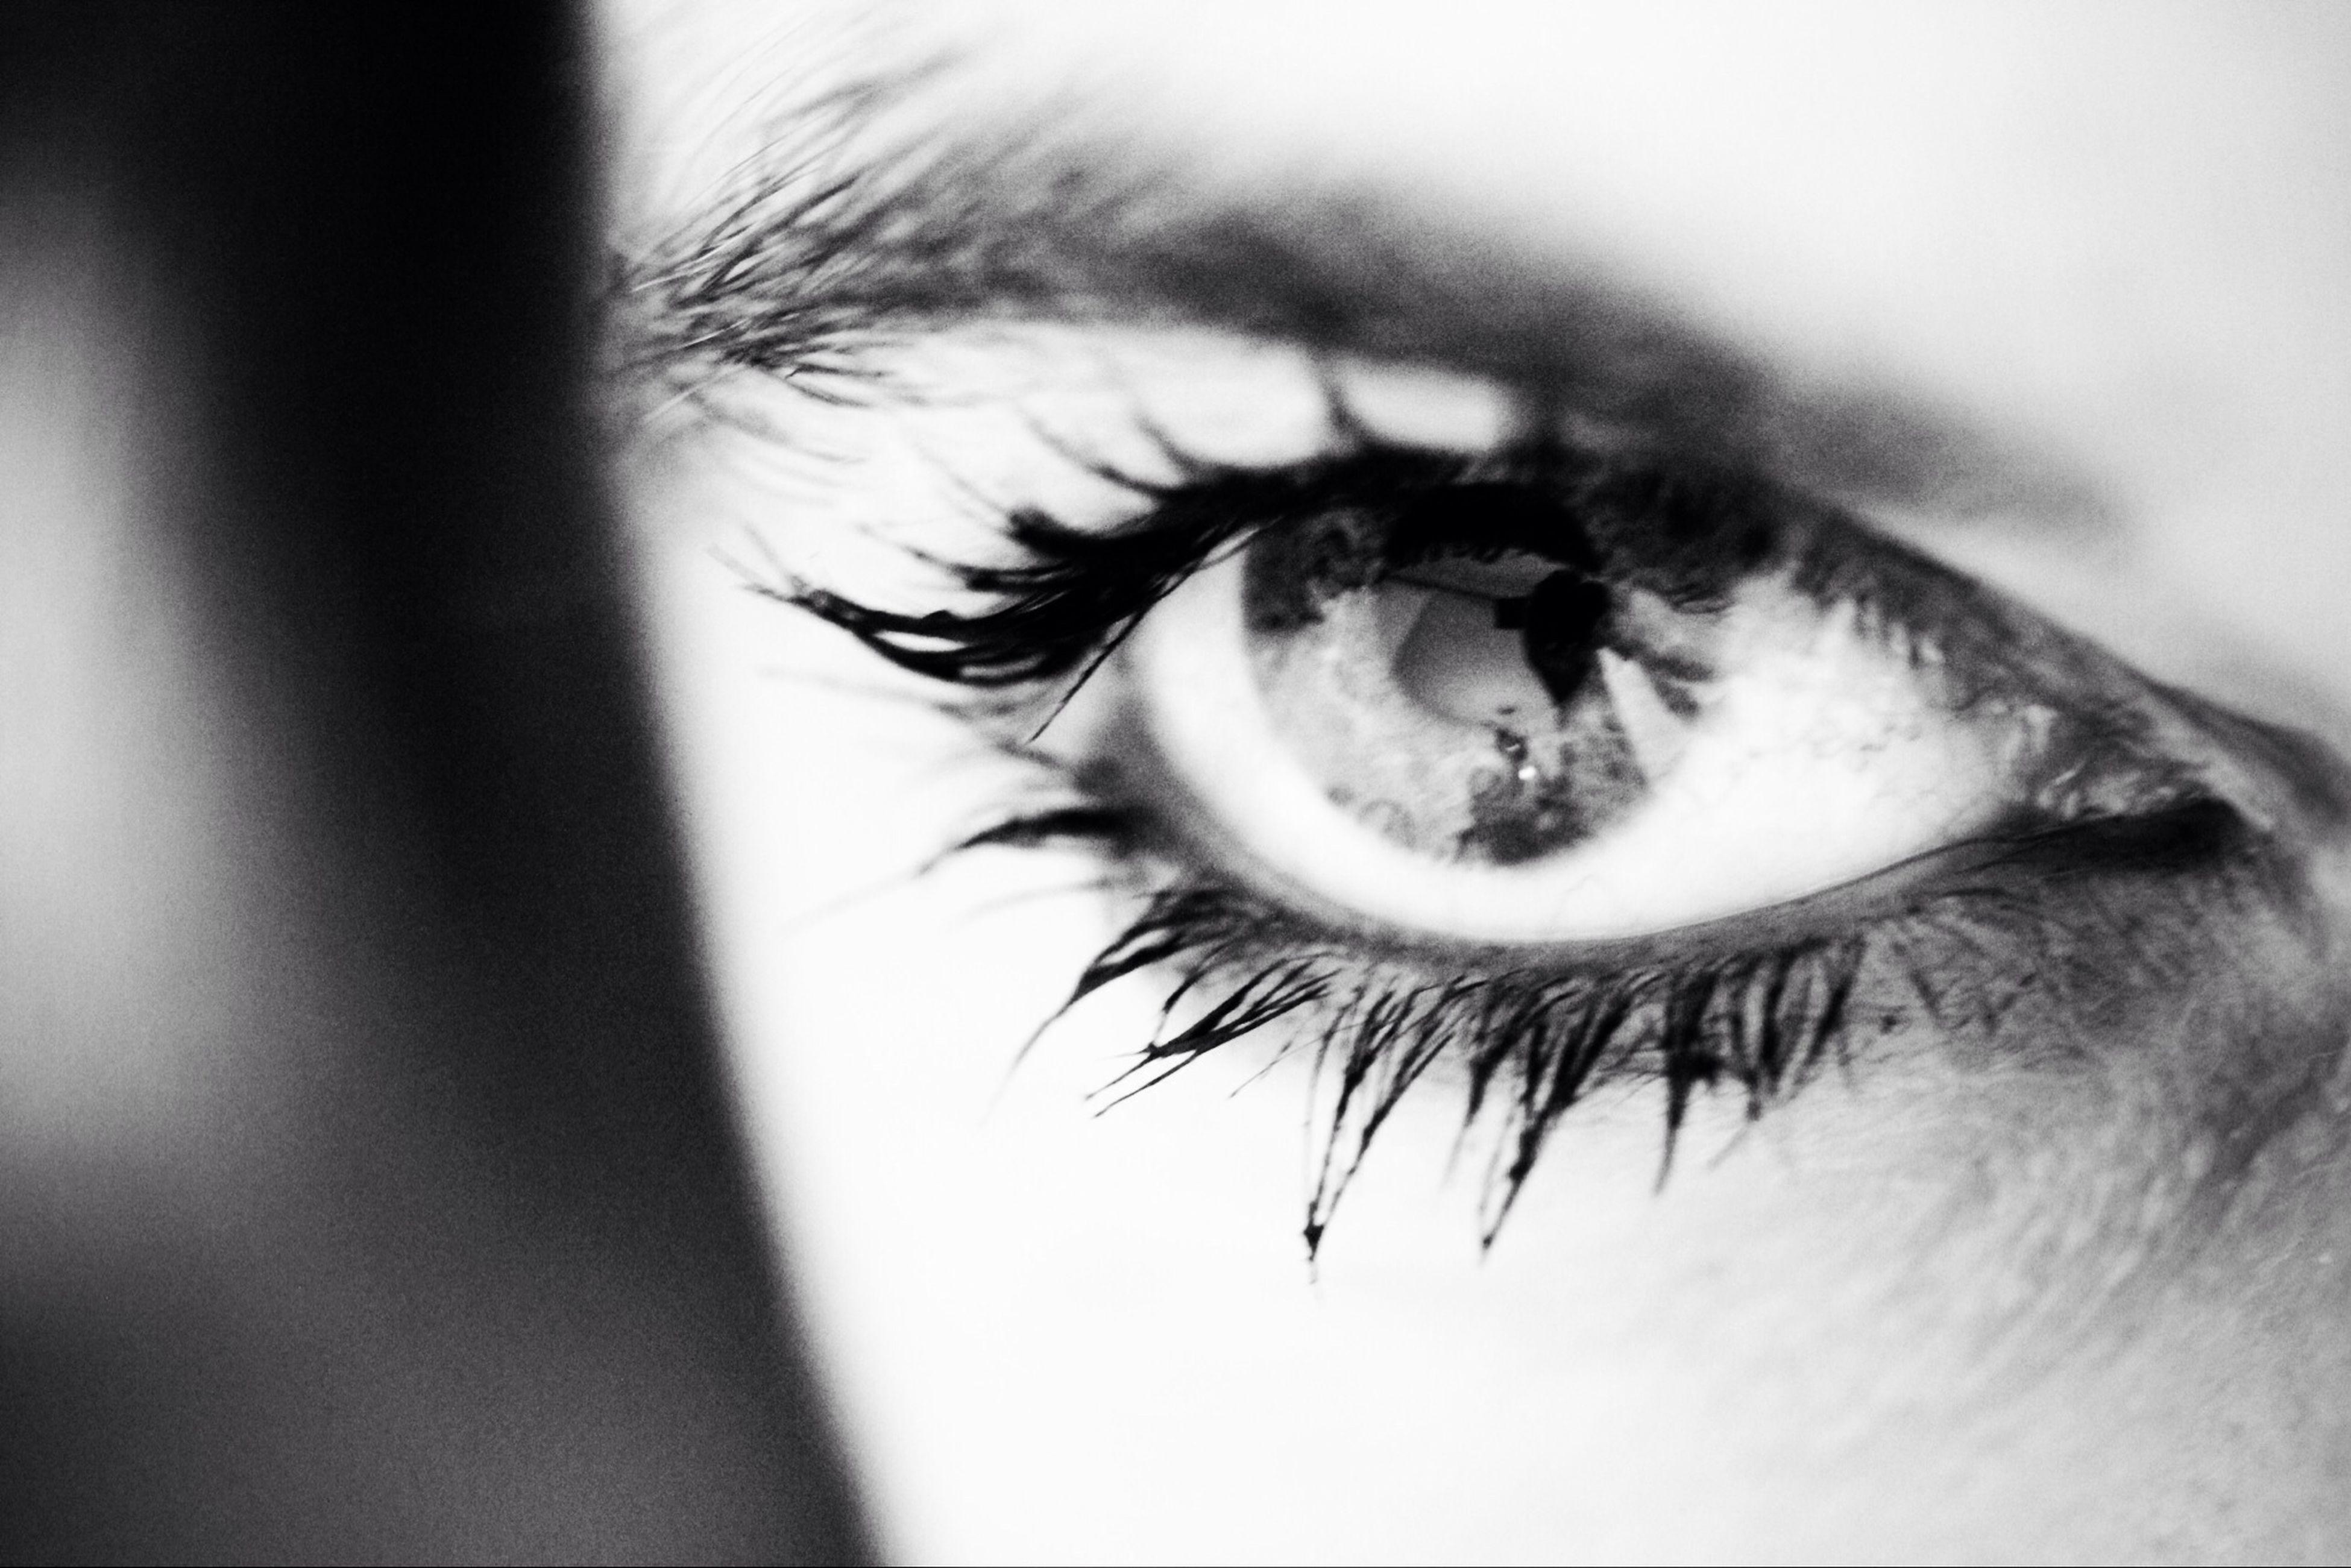 eyelash, human eye, close-up, eyesight, sensory perception, extreme close-up, part of, human skin, eyeball, indoors, unrecognizable person, looking at camera, selective focus, extreme close up, lifestyles, iris - eye, human face